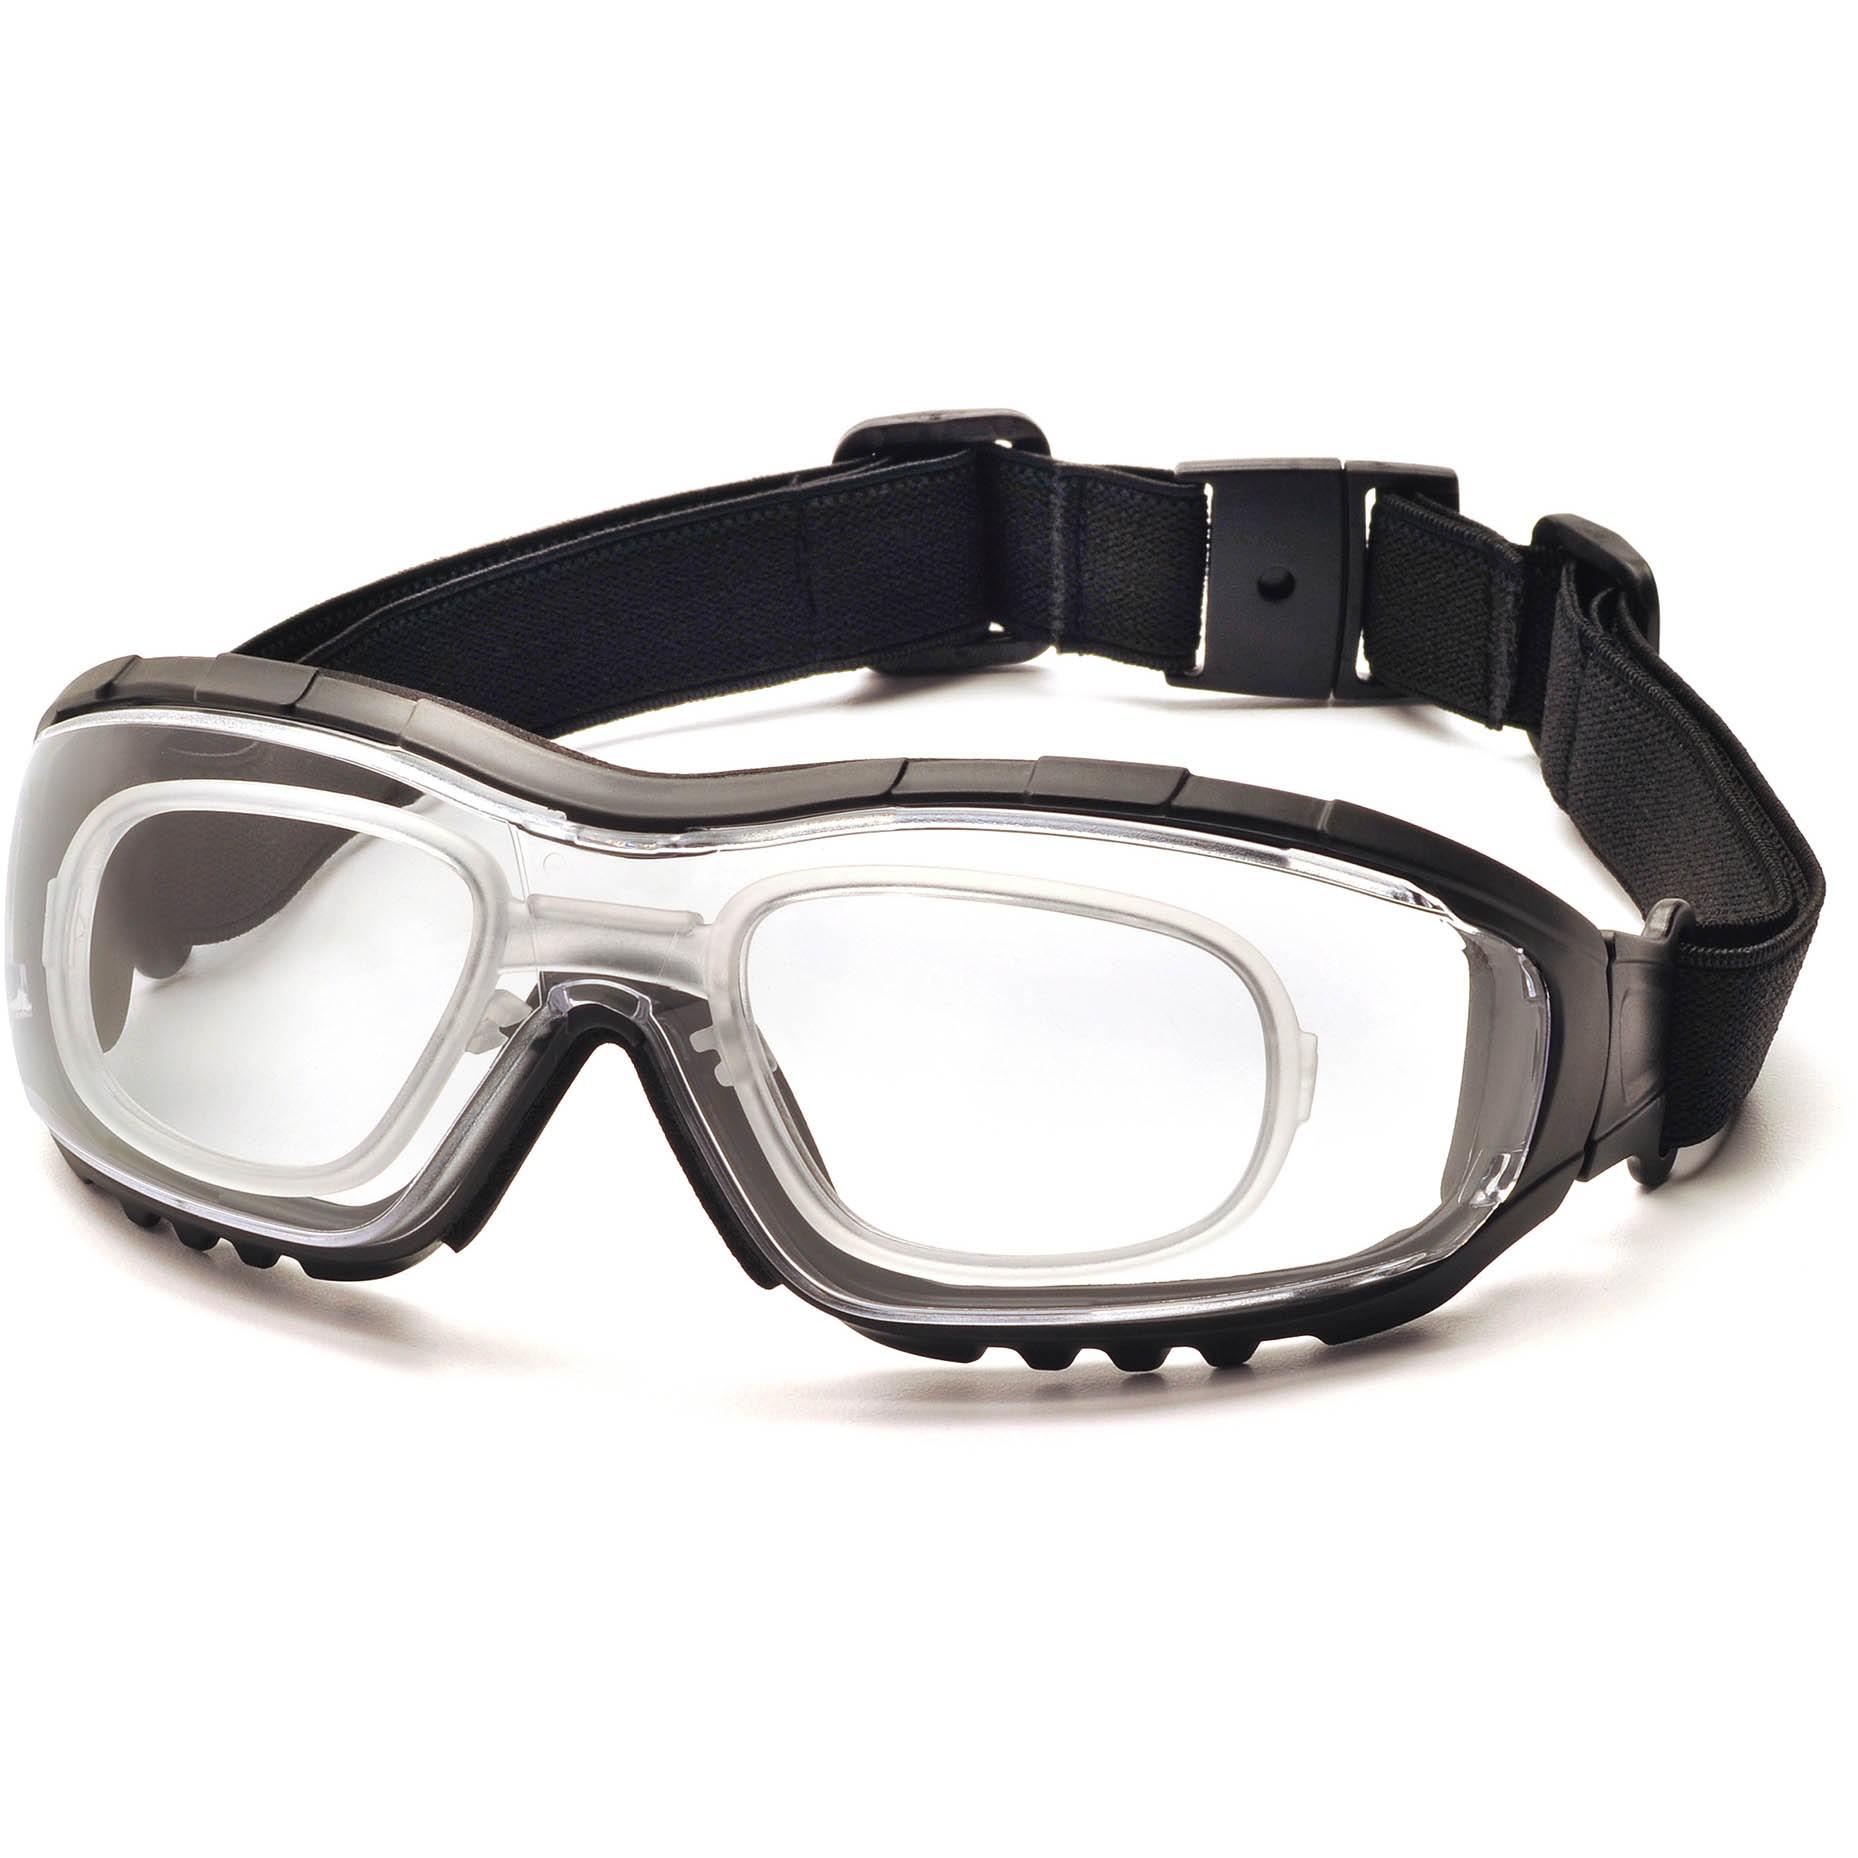 Pyramex V3G RX Options Safety Glasses/Goggles - Black ...